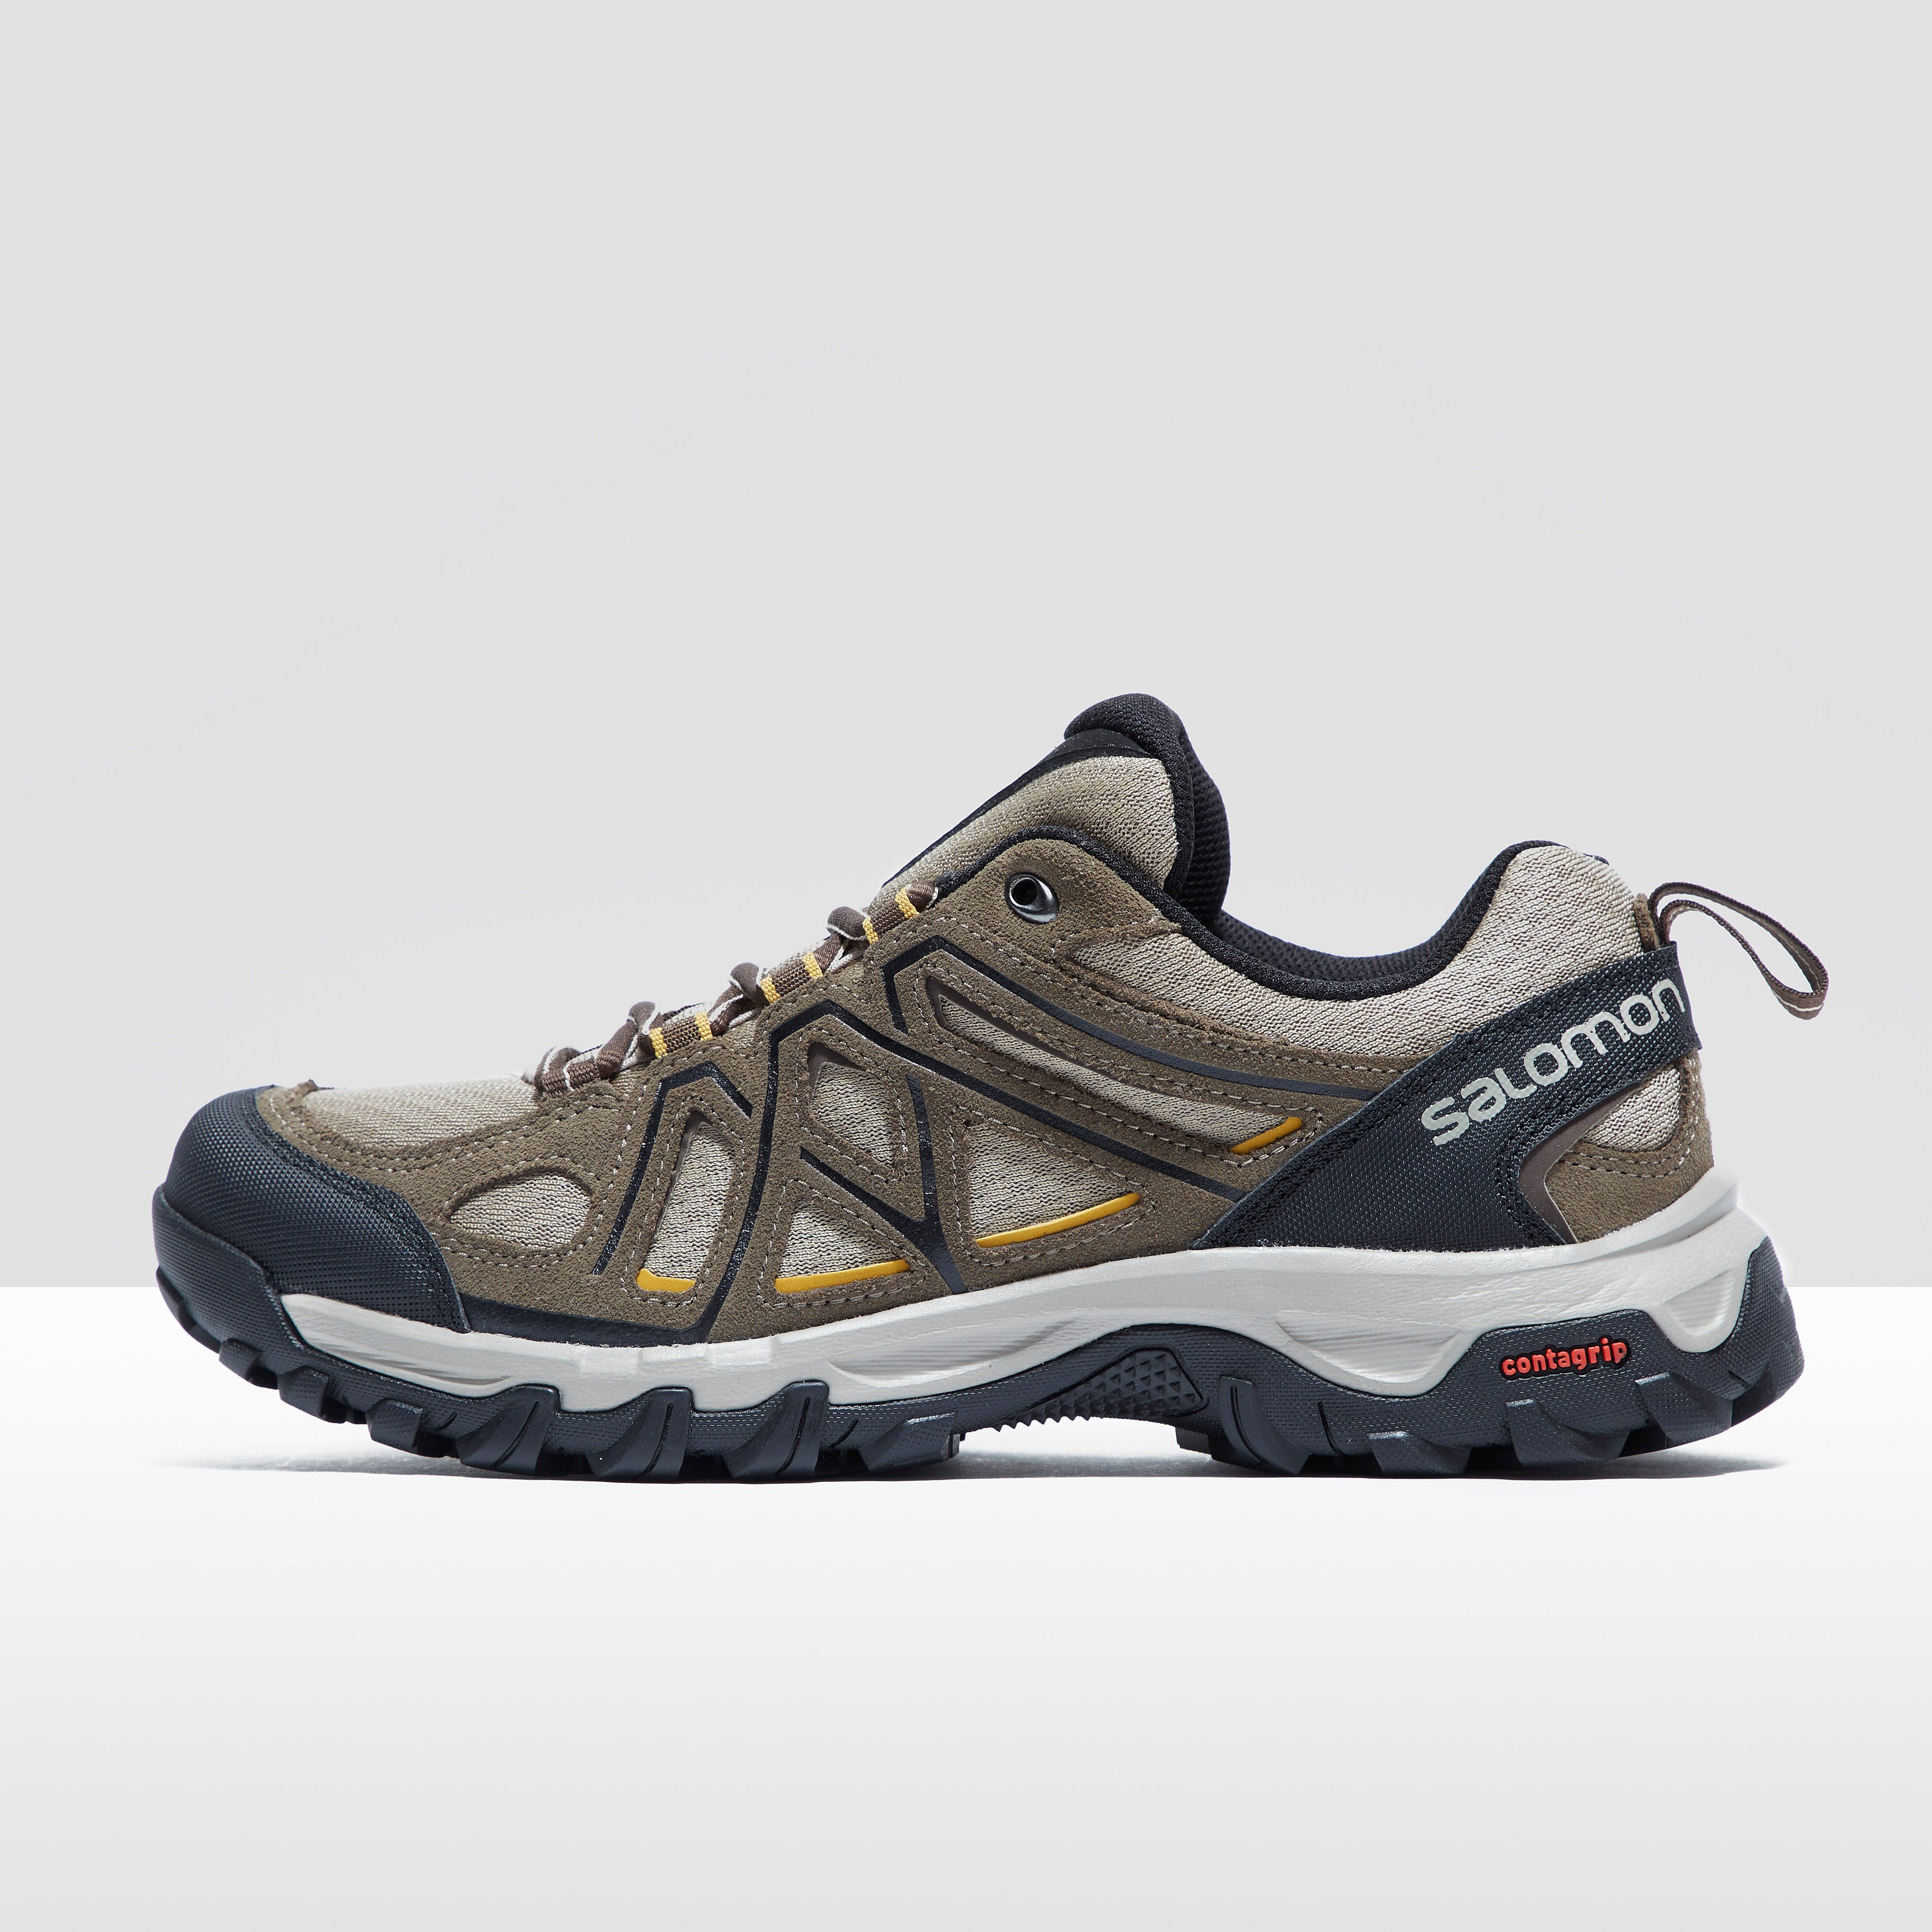 2 Shoes Aero Hiking Men's Evasion Salomon Bx5pqvq